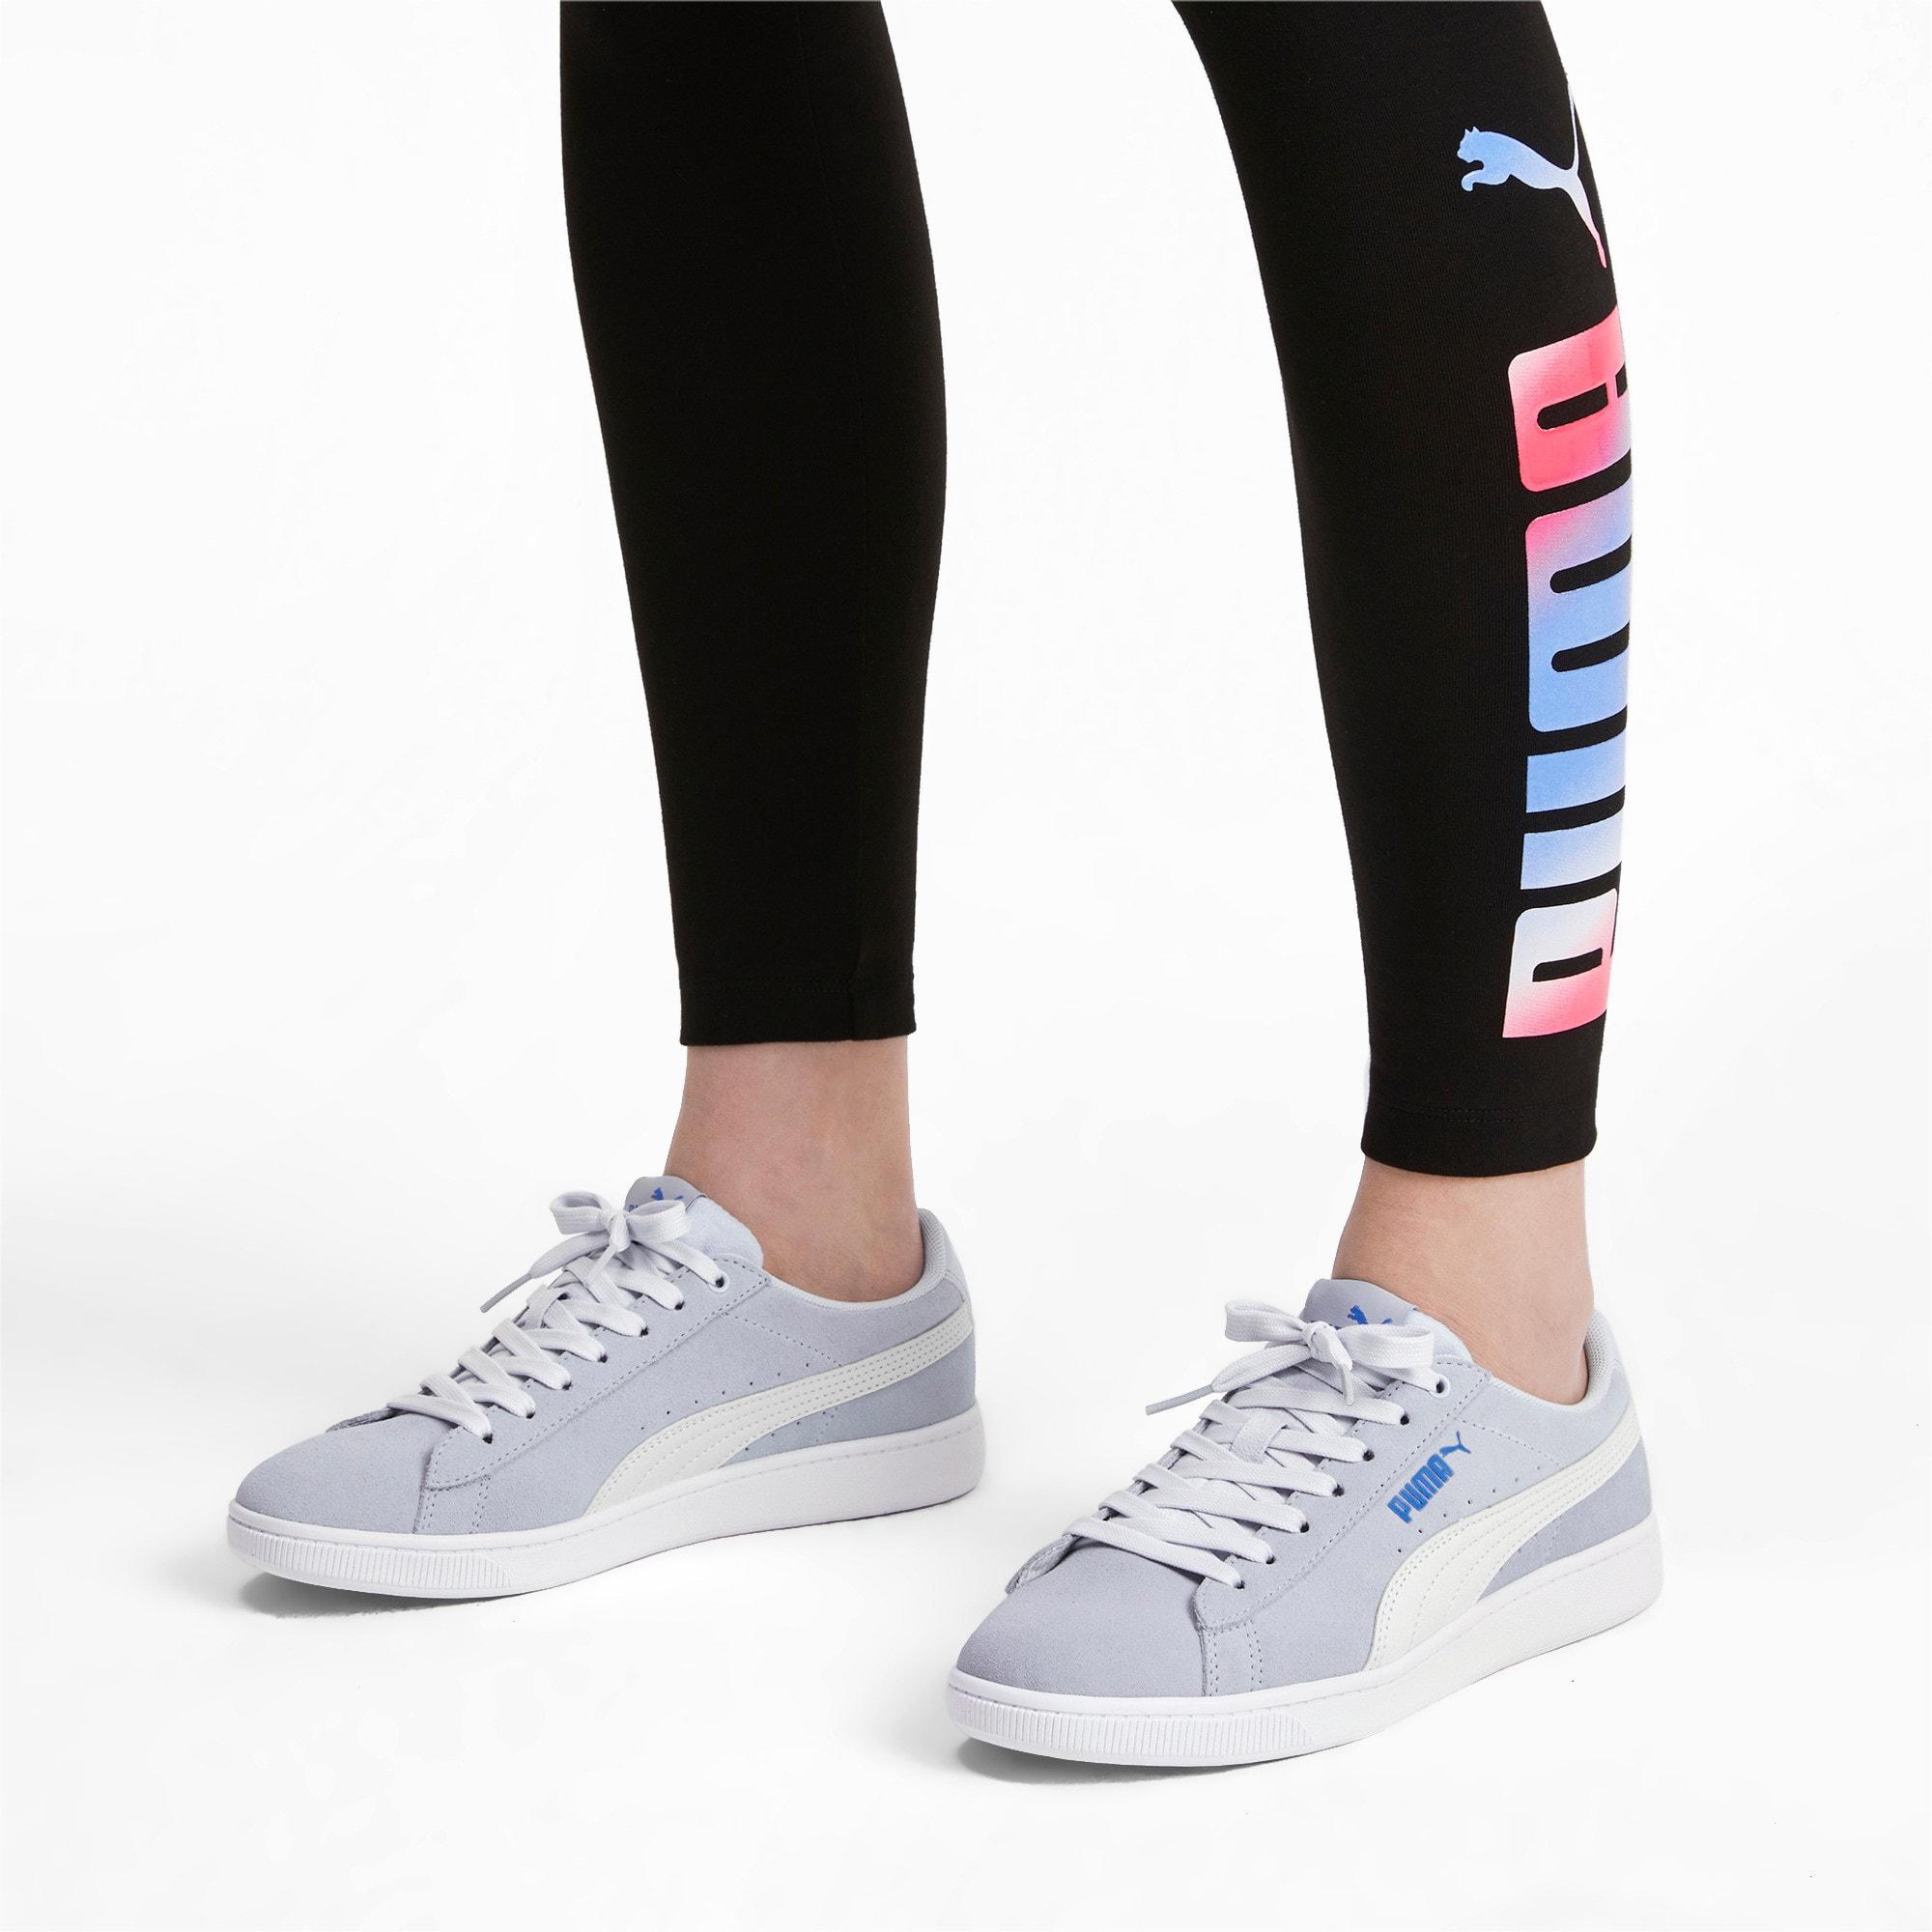 Thumbnail 3 of PUMA Vikky v2 Women's Sneakers, Heather-Ultramarine-White, medium